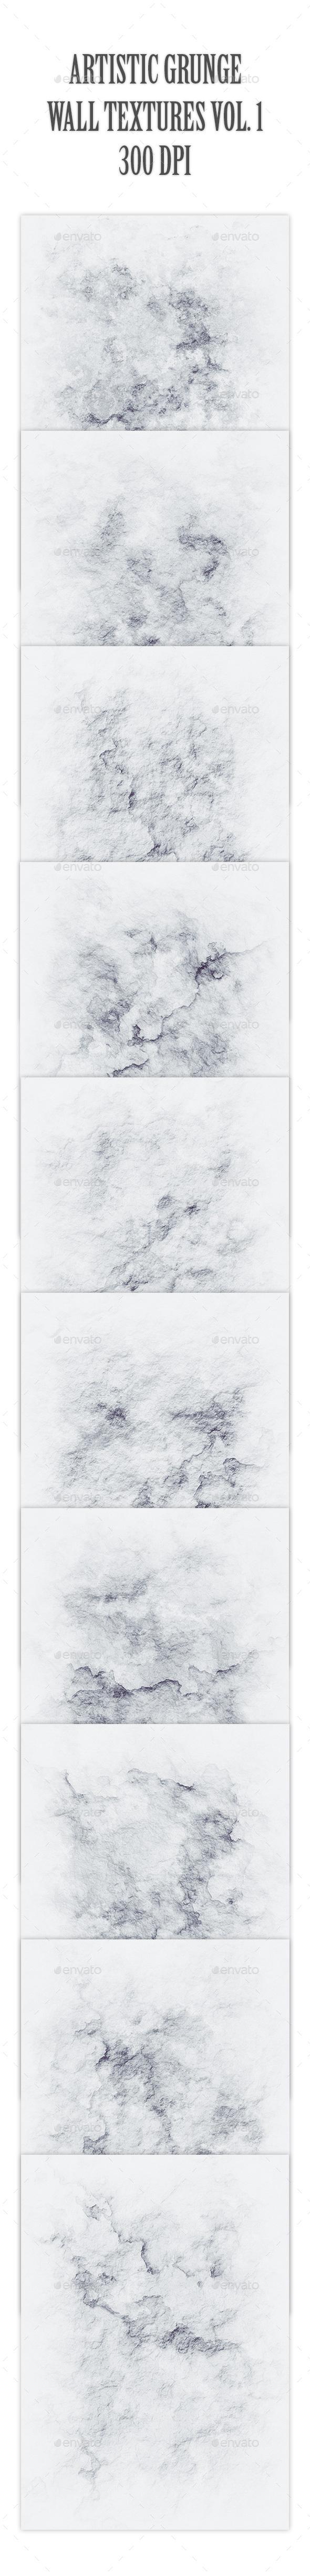 Artistic Grunge Wall Textures Vol. 1 - Industrial / Grunge Textures